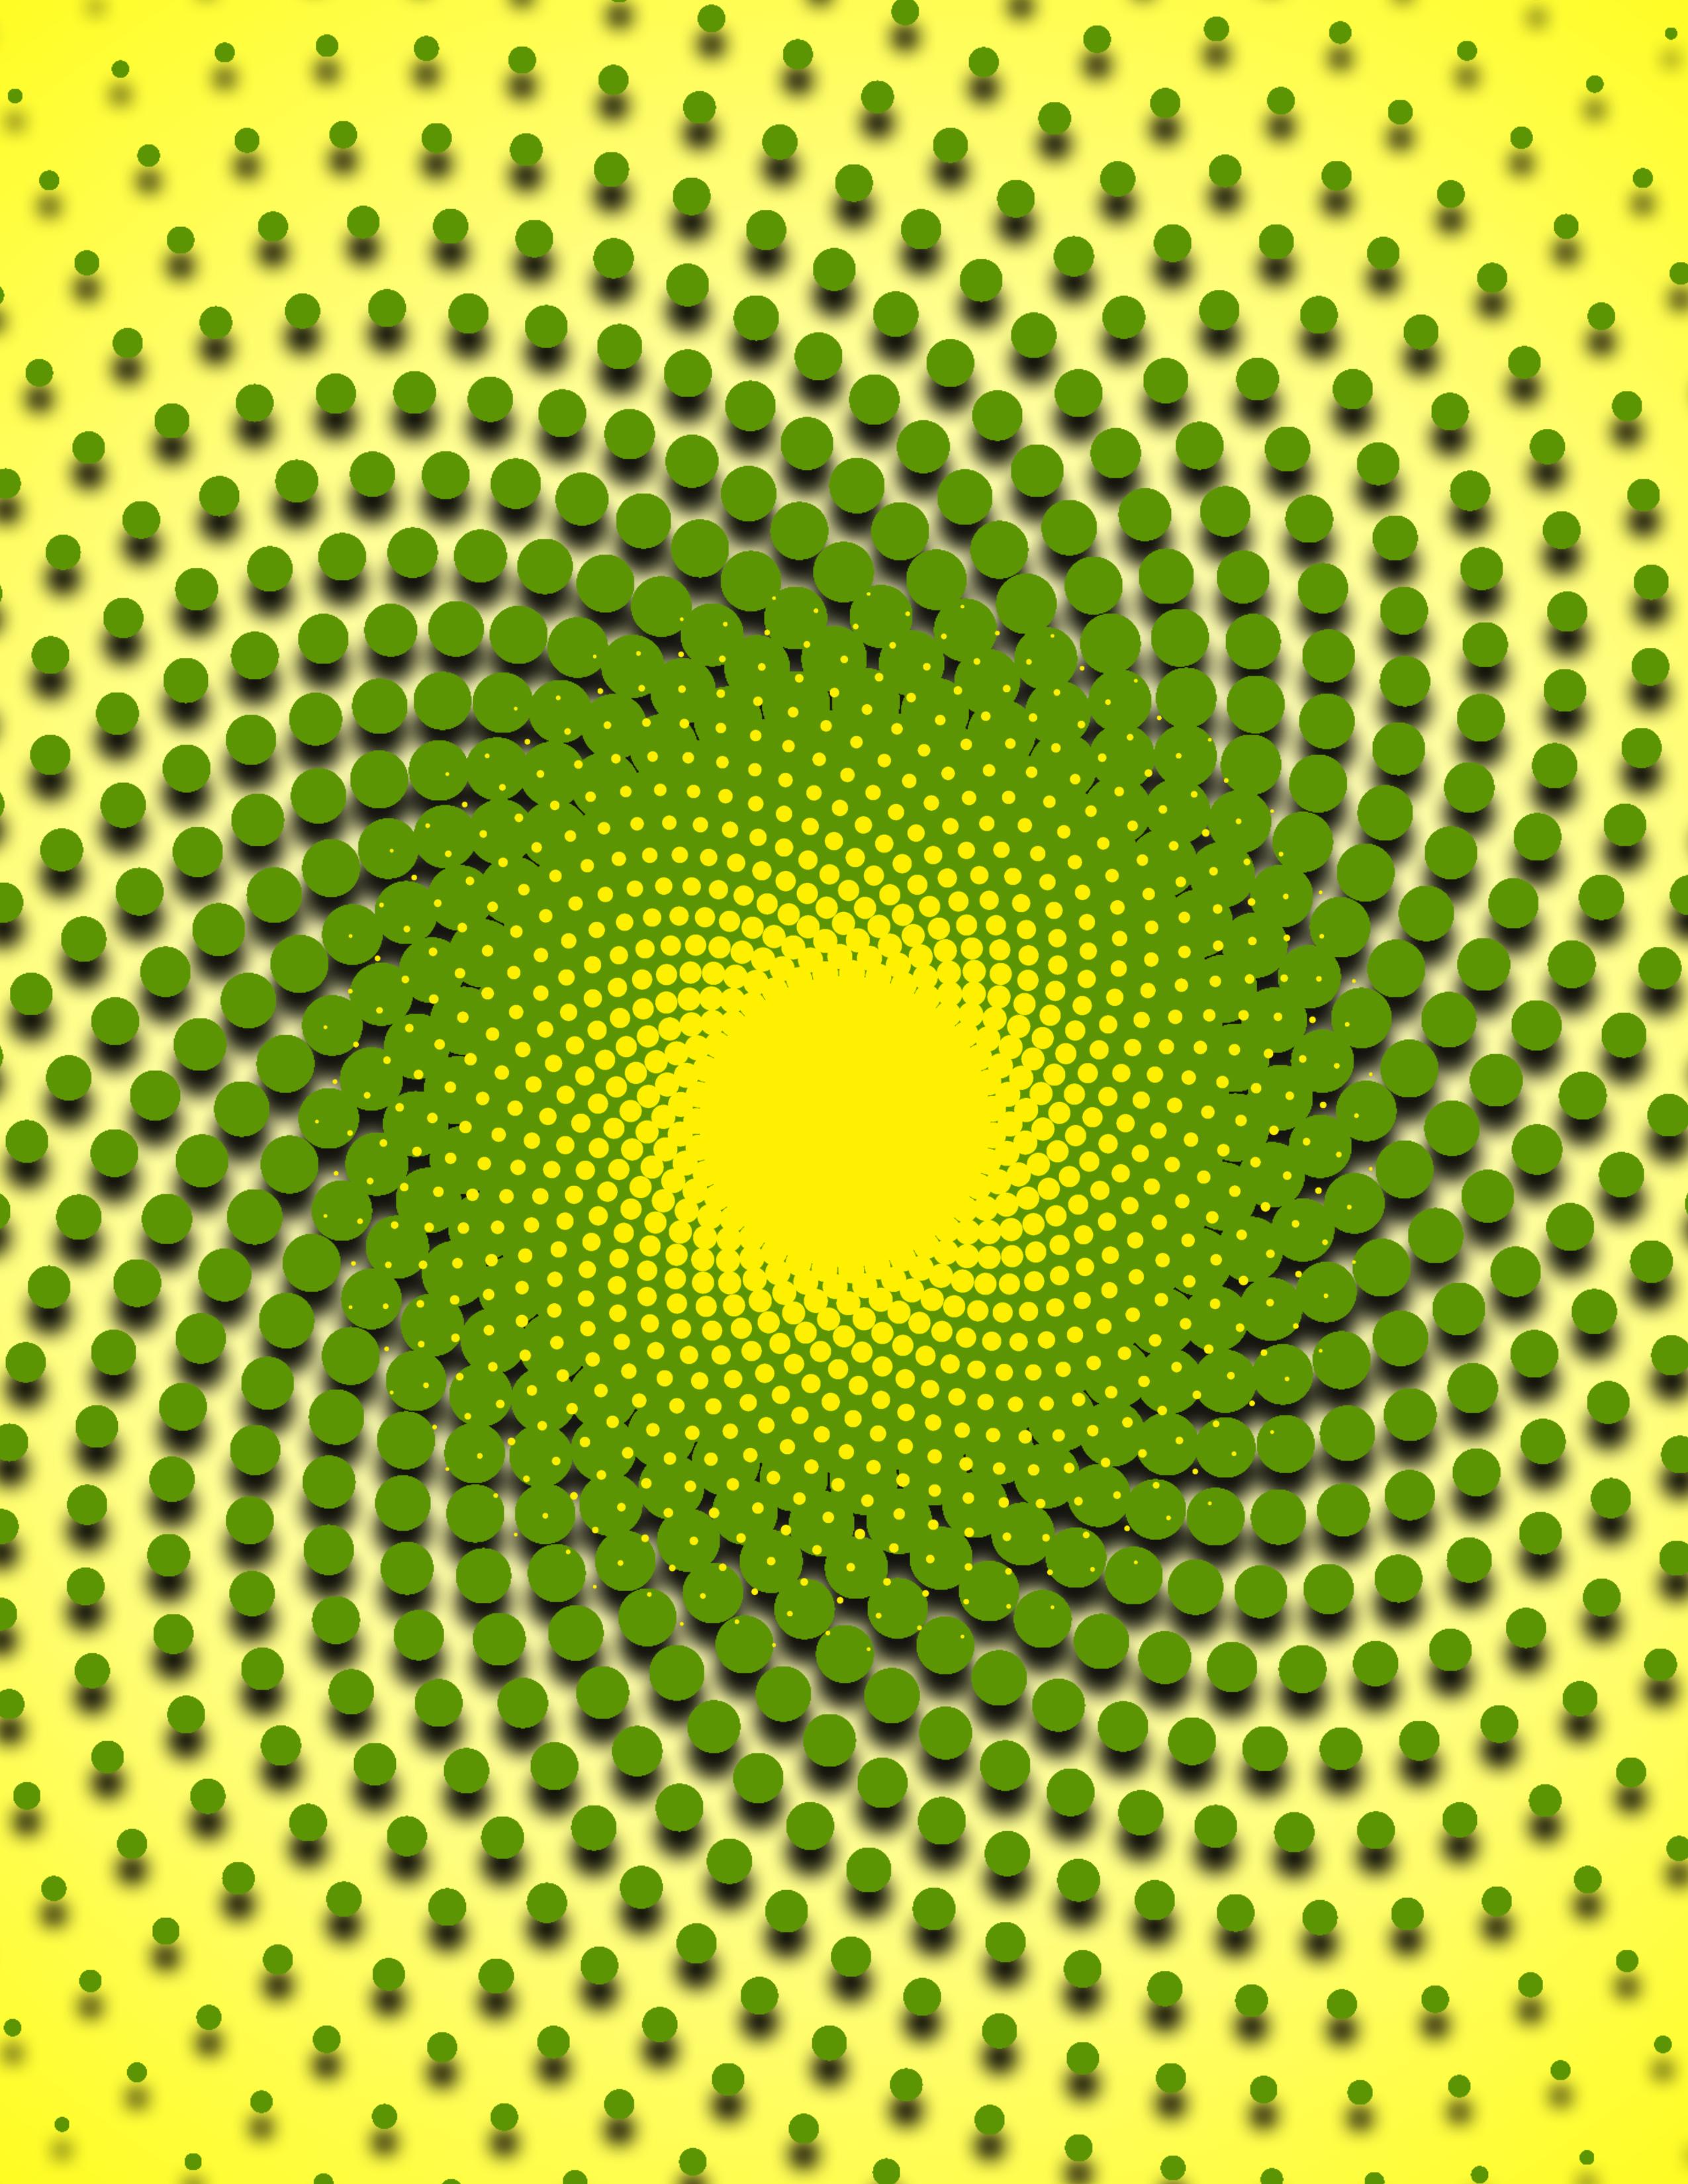 Flow dot background.jpg